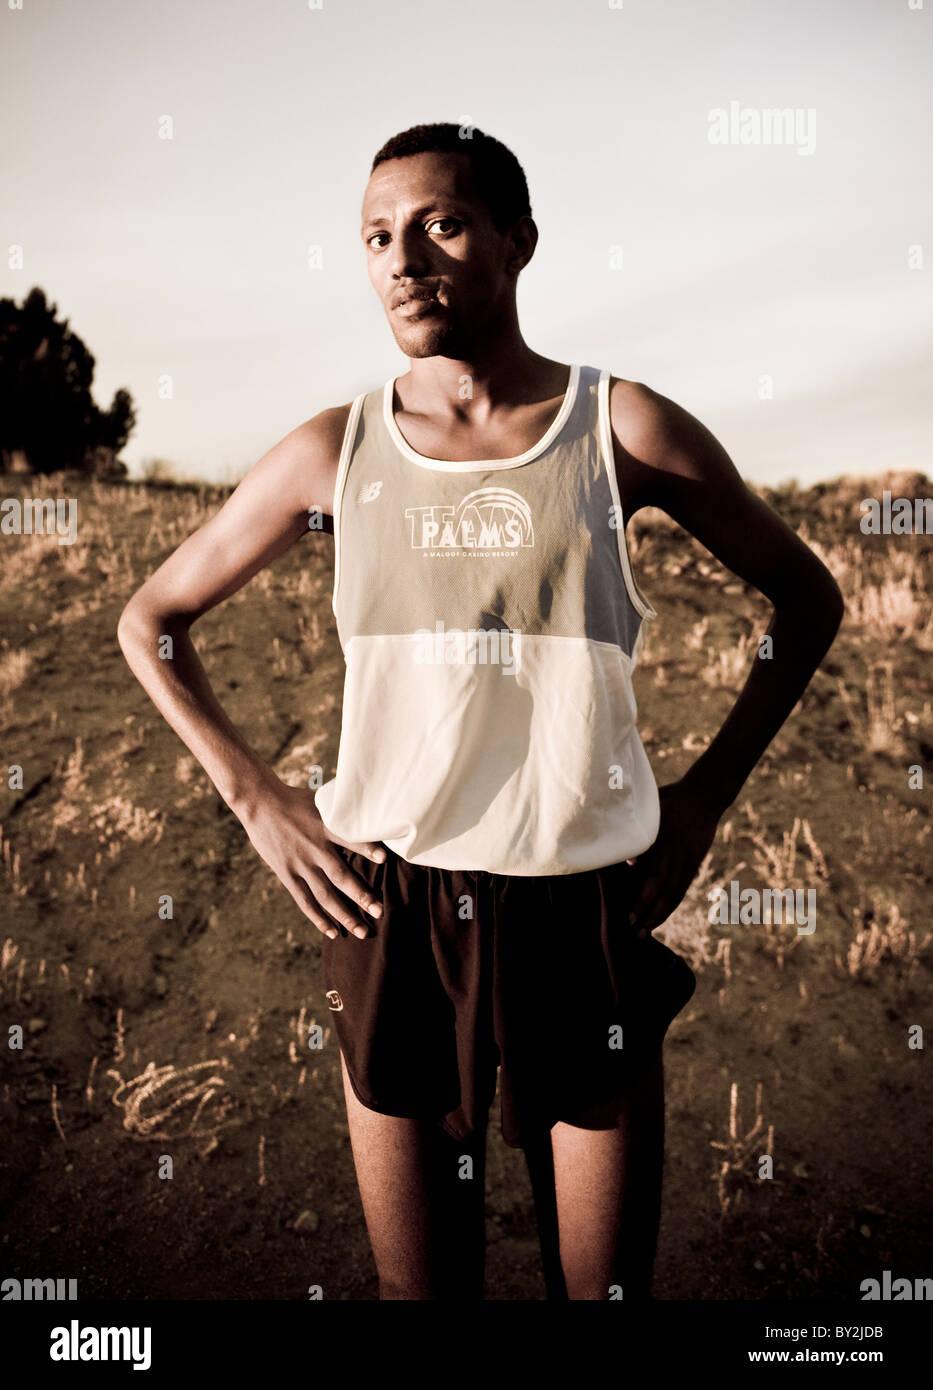 Portrait of a marathon runner - Stock Image